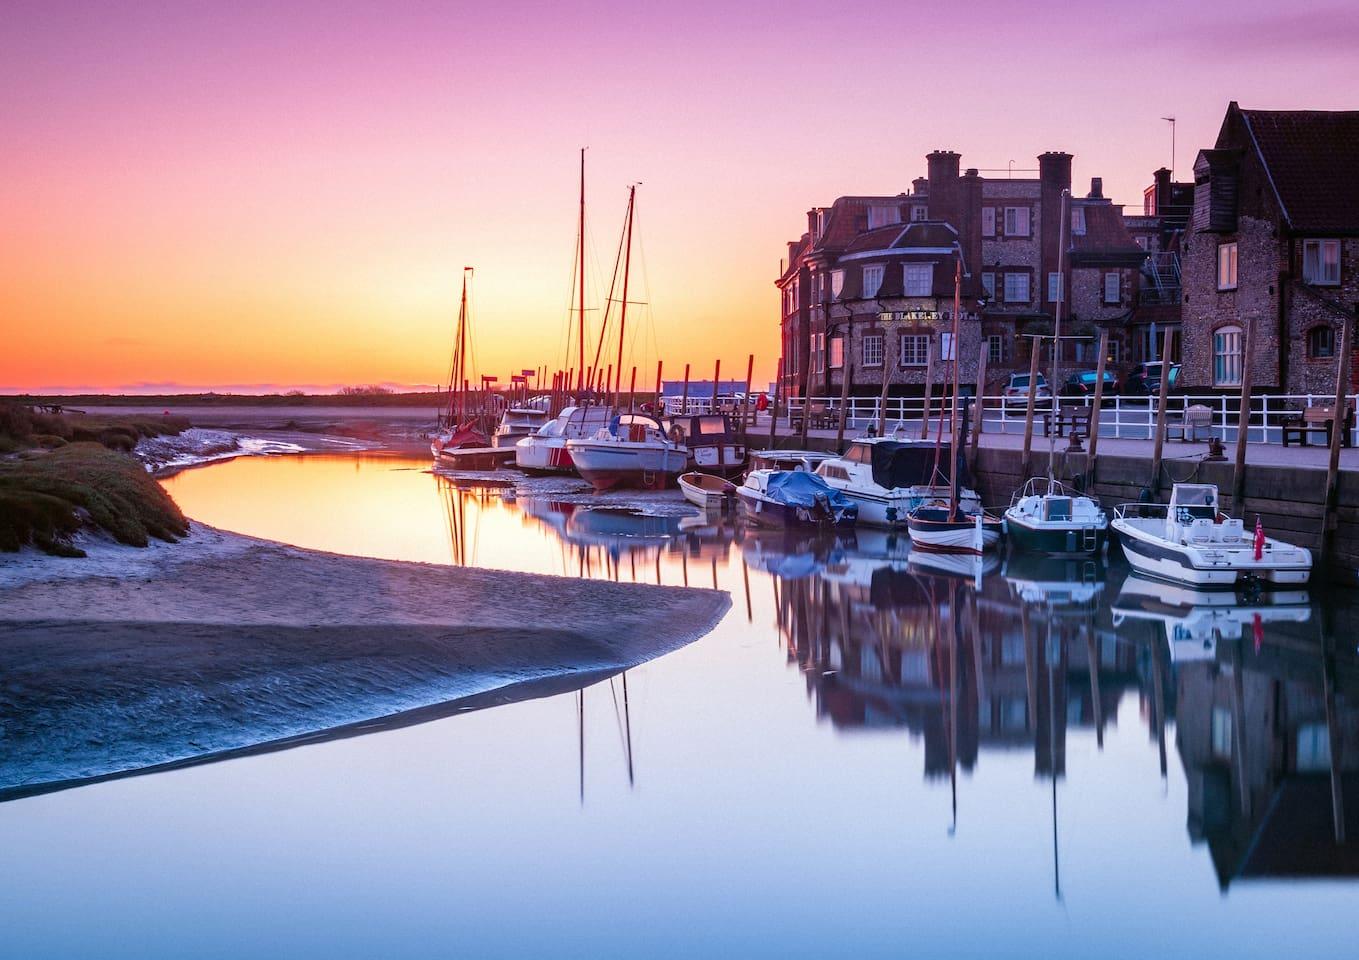 Beautiful Blakeney Quay at sunrise.